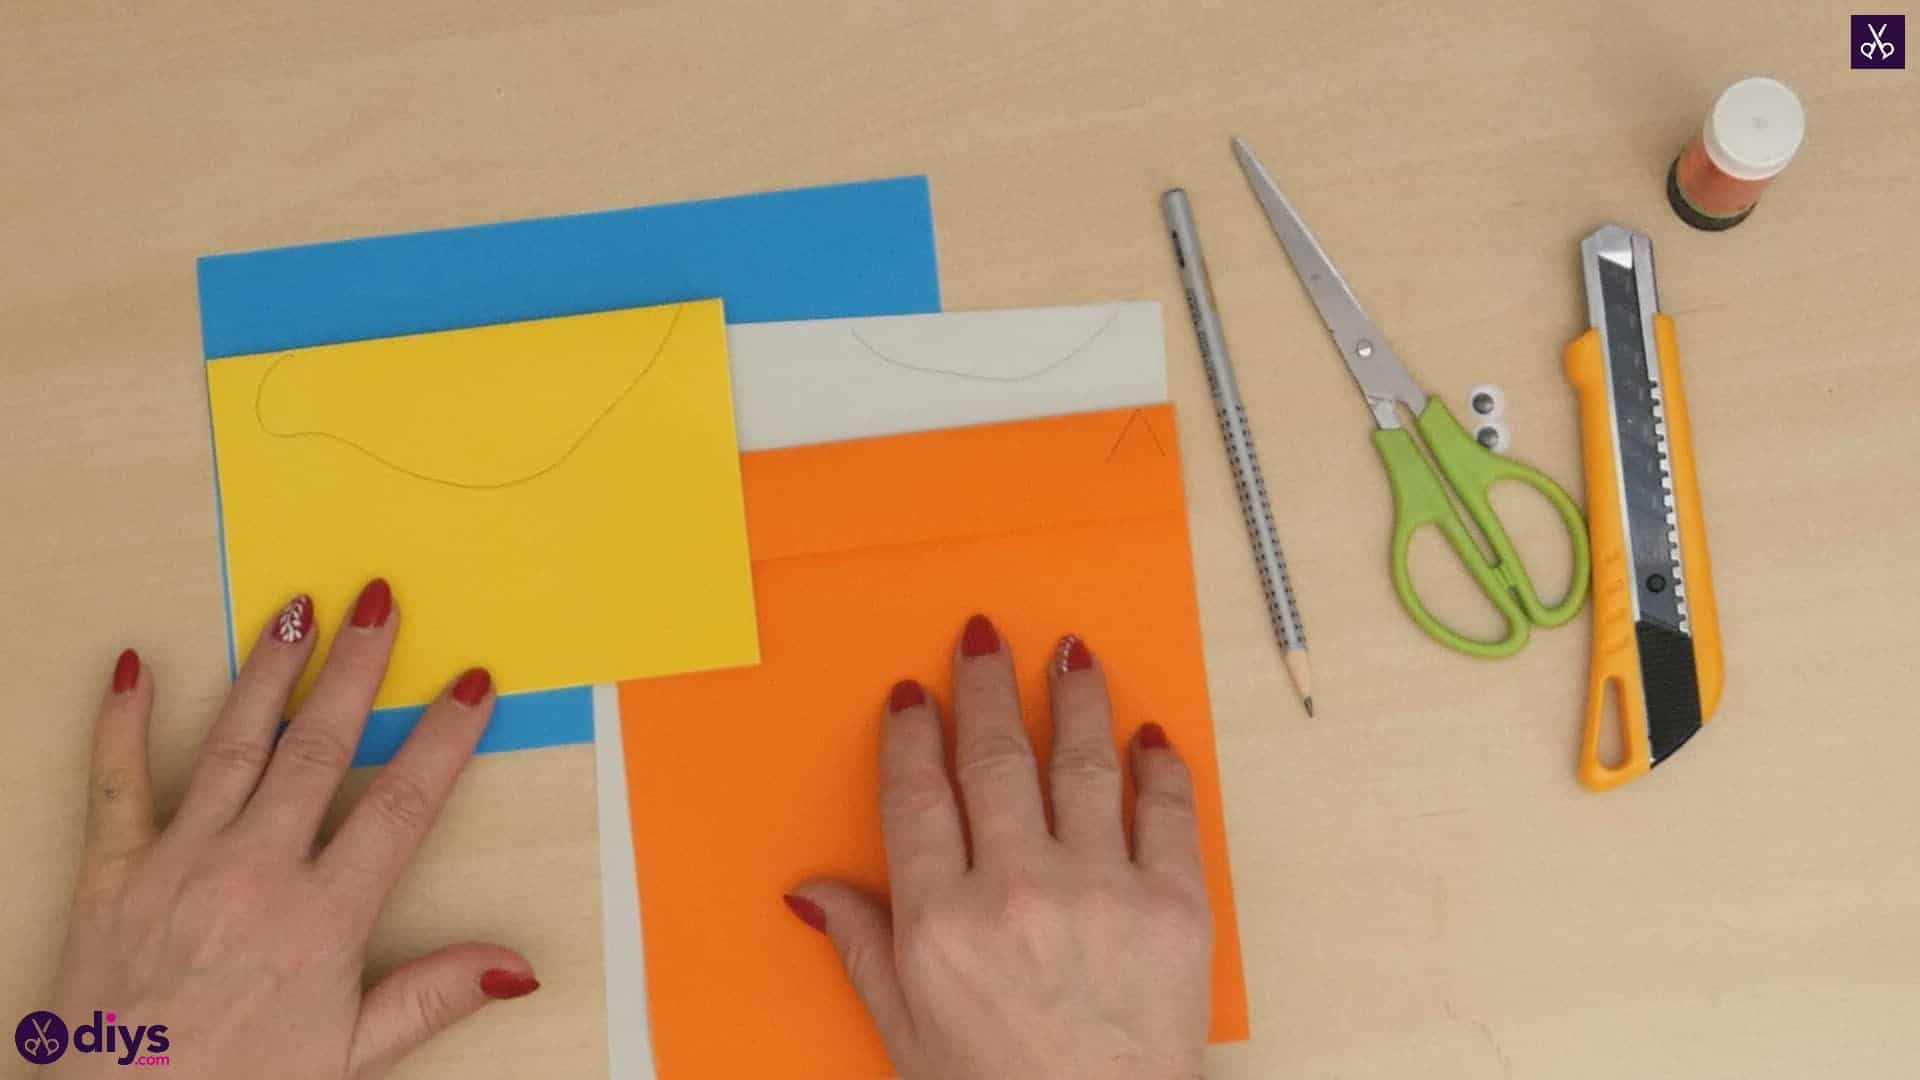 Diy easy paper bird step 5